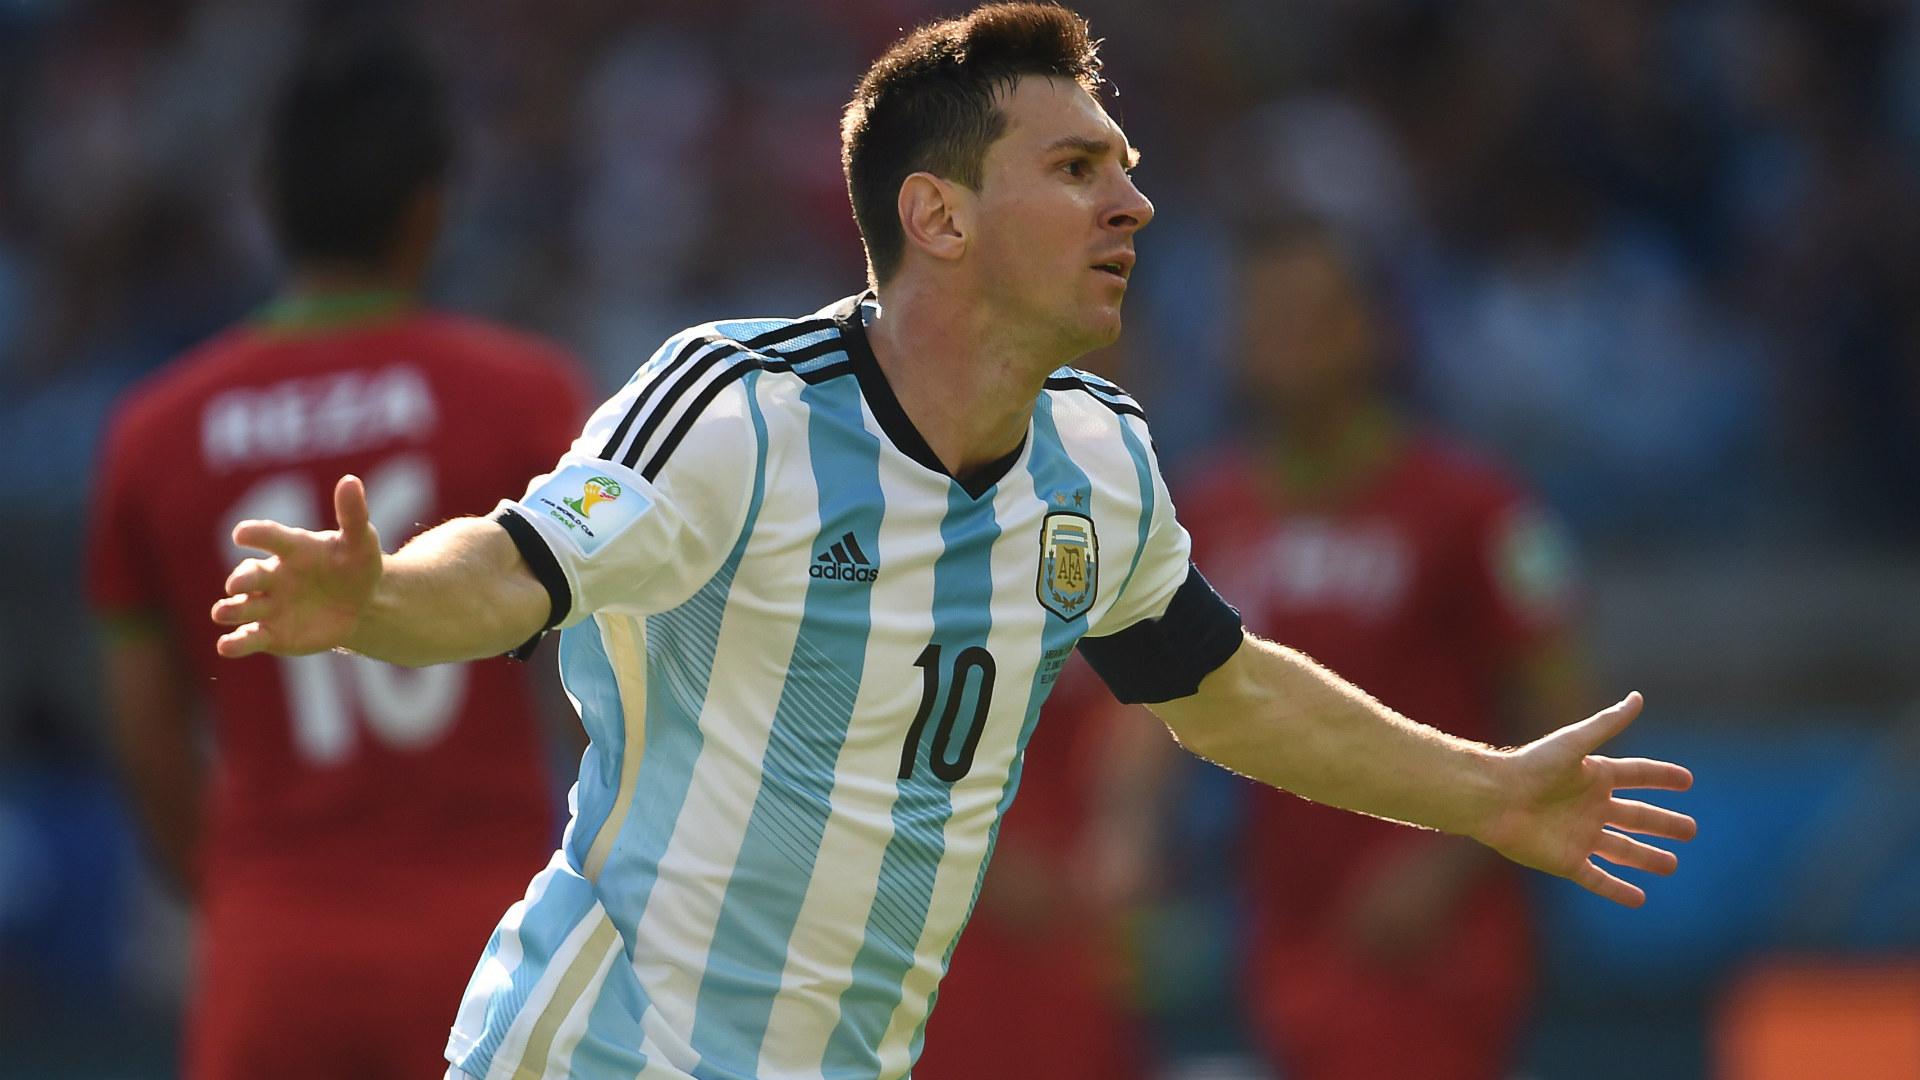 River estuvo cerca de contratar a Messi: ¿qué pasó?